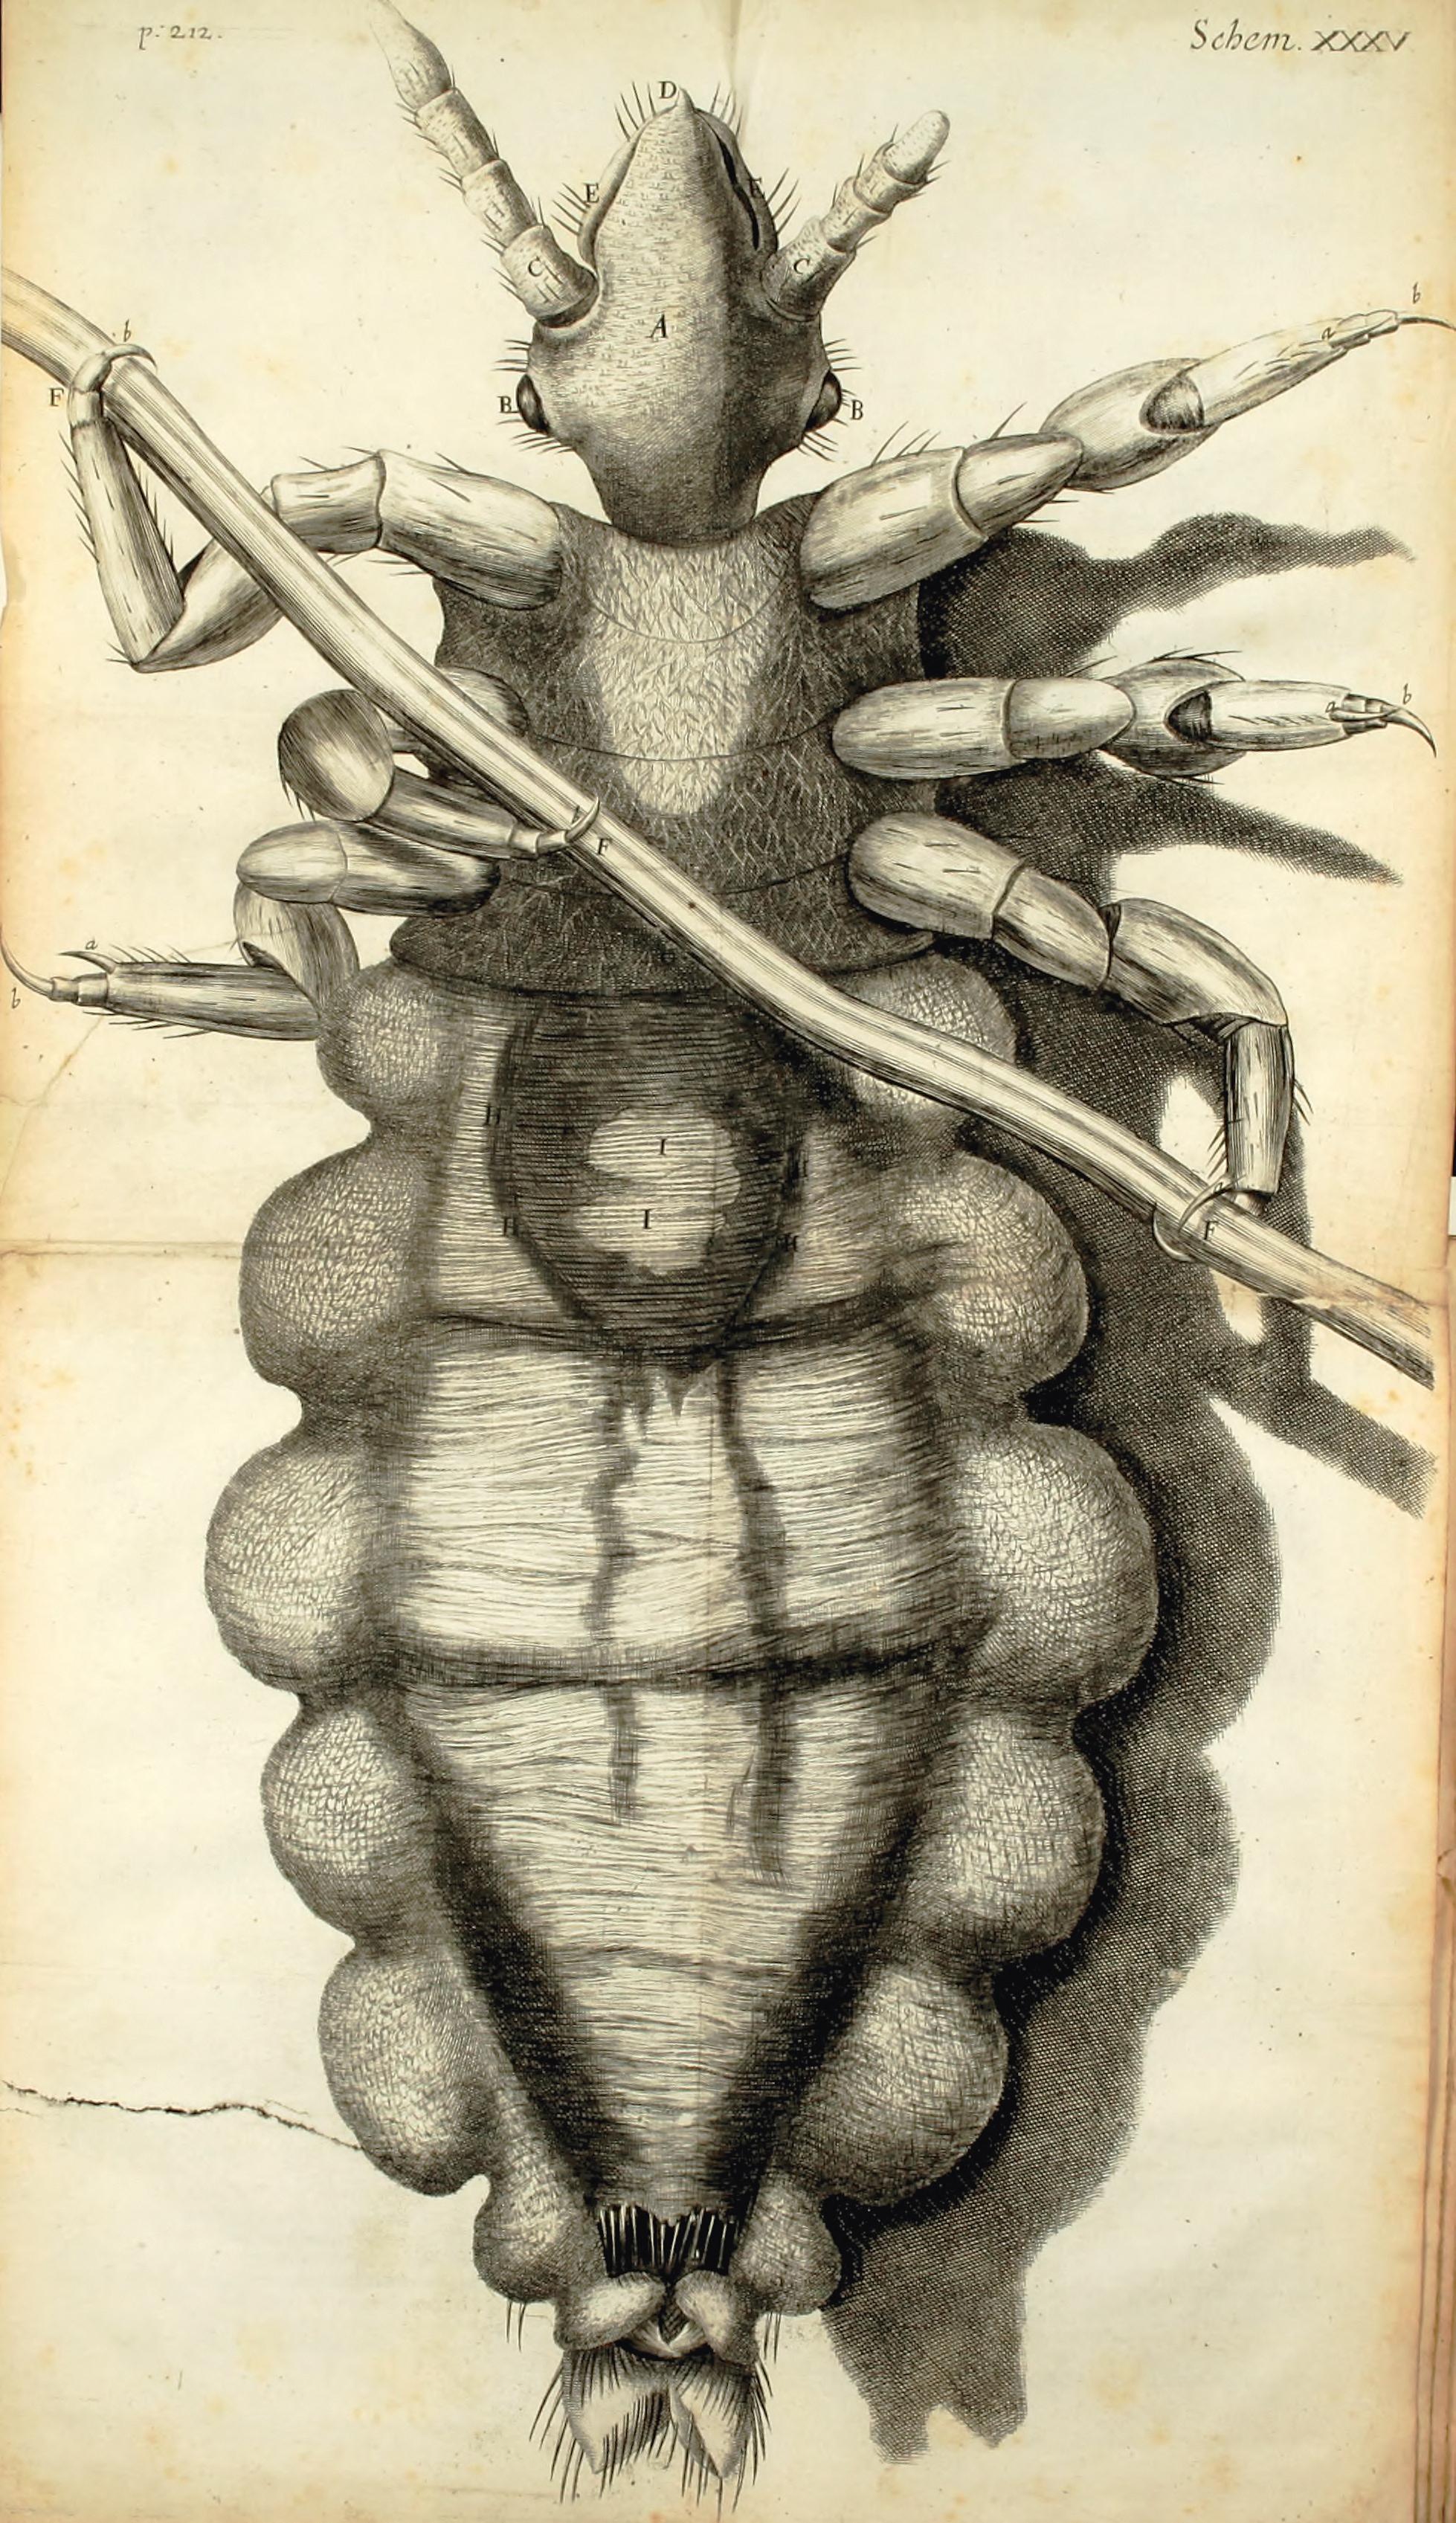 Robert Hooke, The Louse, from Micrographia,1665, Duke University Libraries, Durham, NC